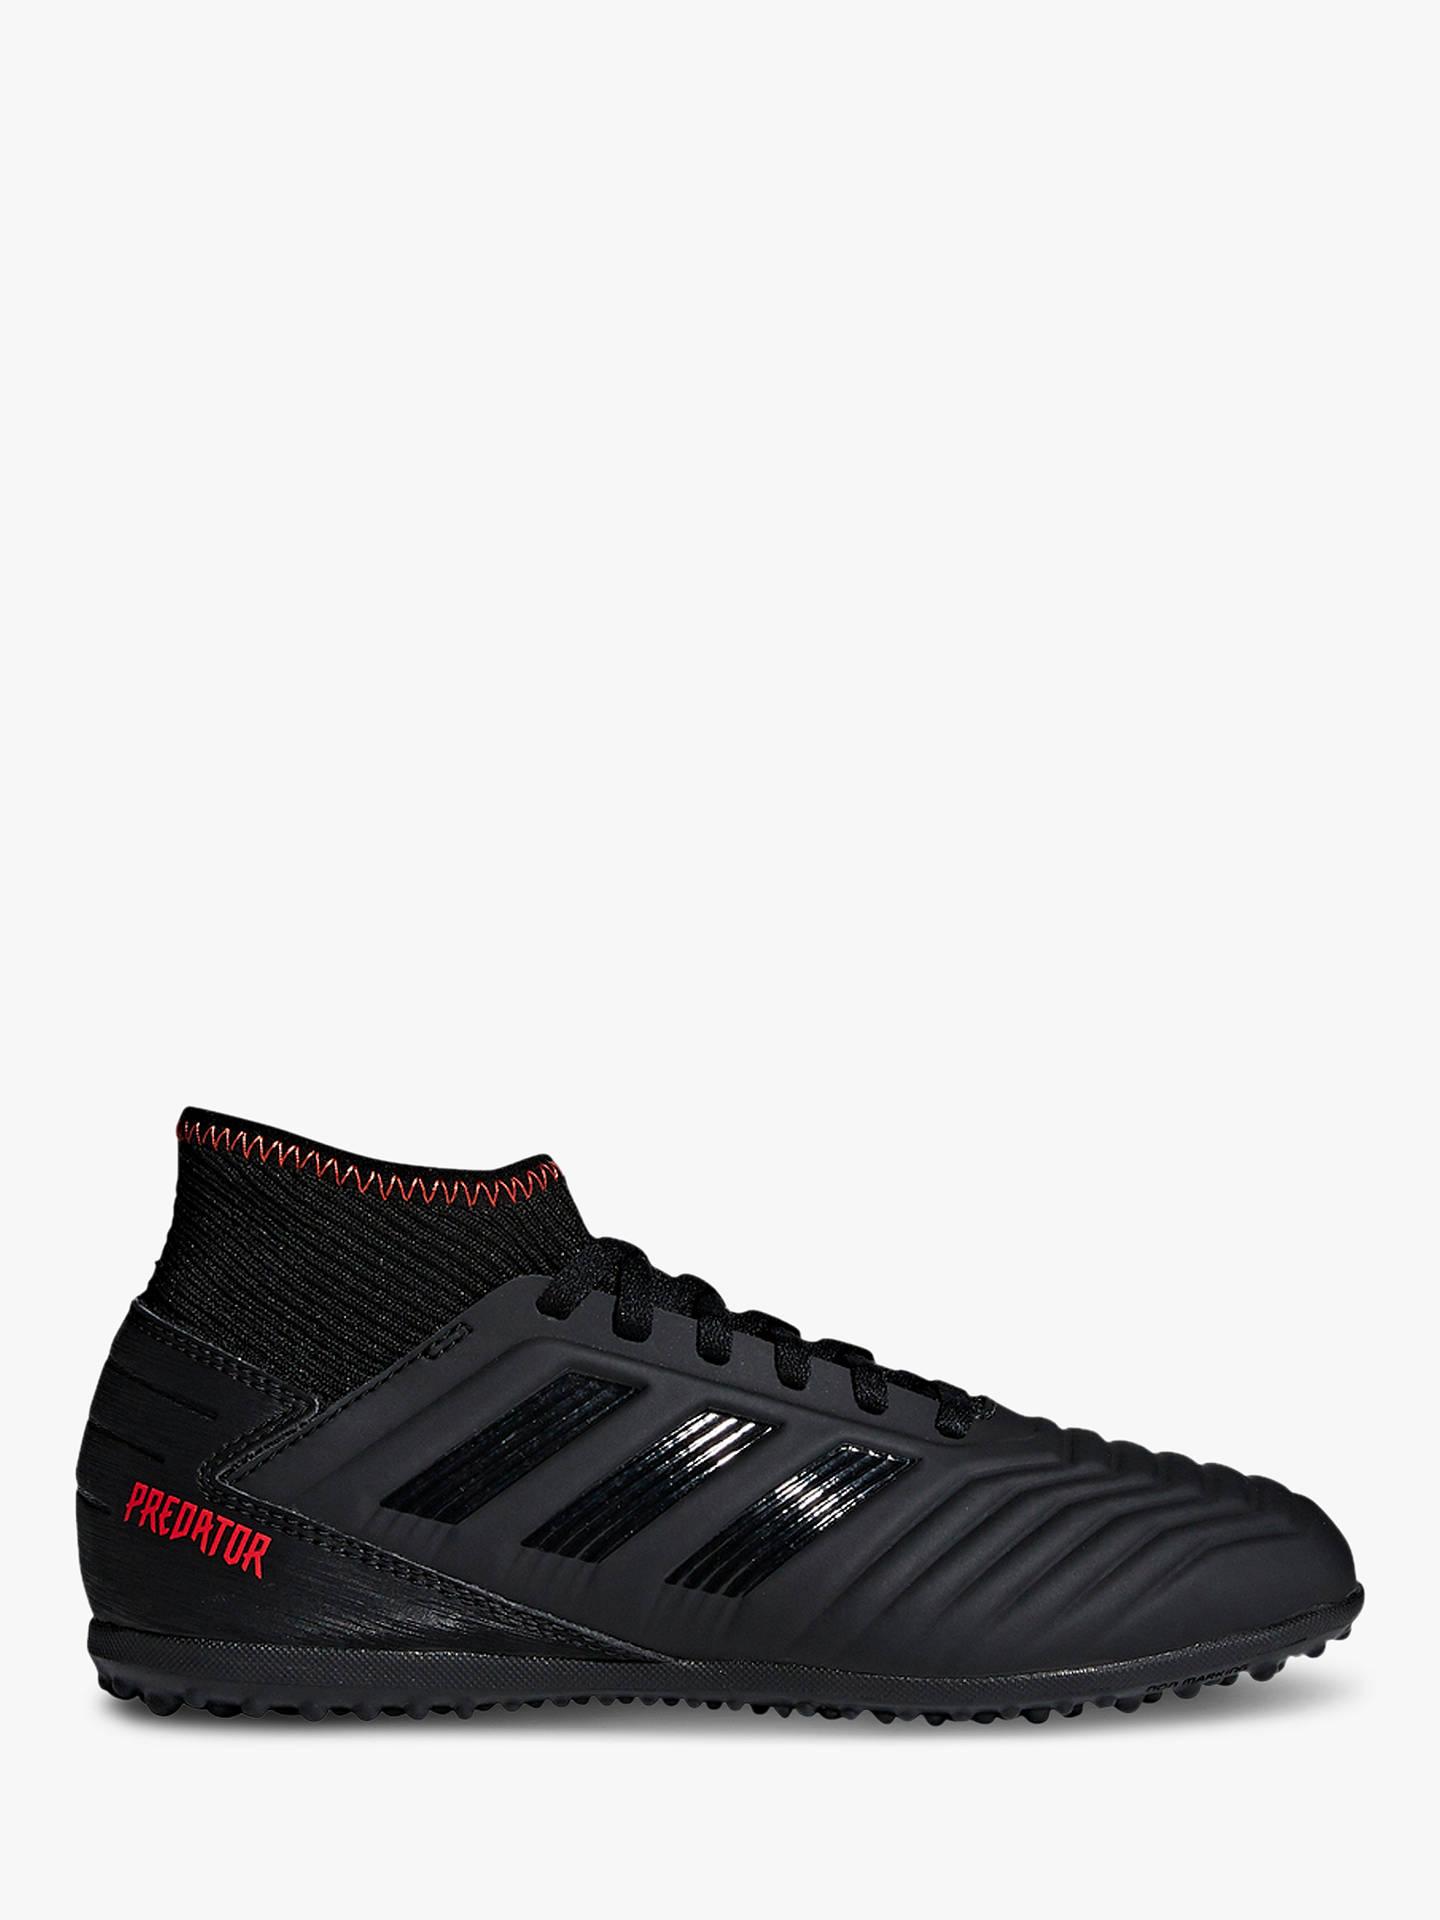 ab74affd8db adidas Children's Predator Tango 19.3 Turf Football Boots, Core  Black/Active Red